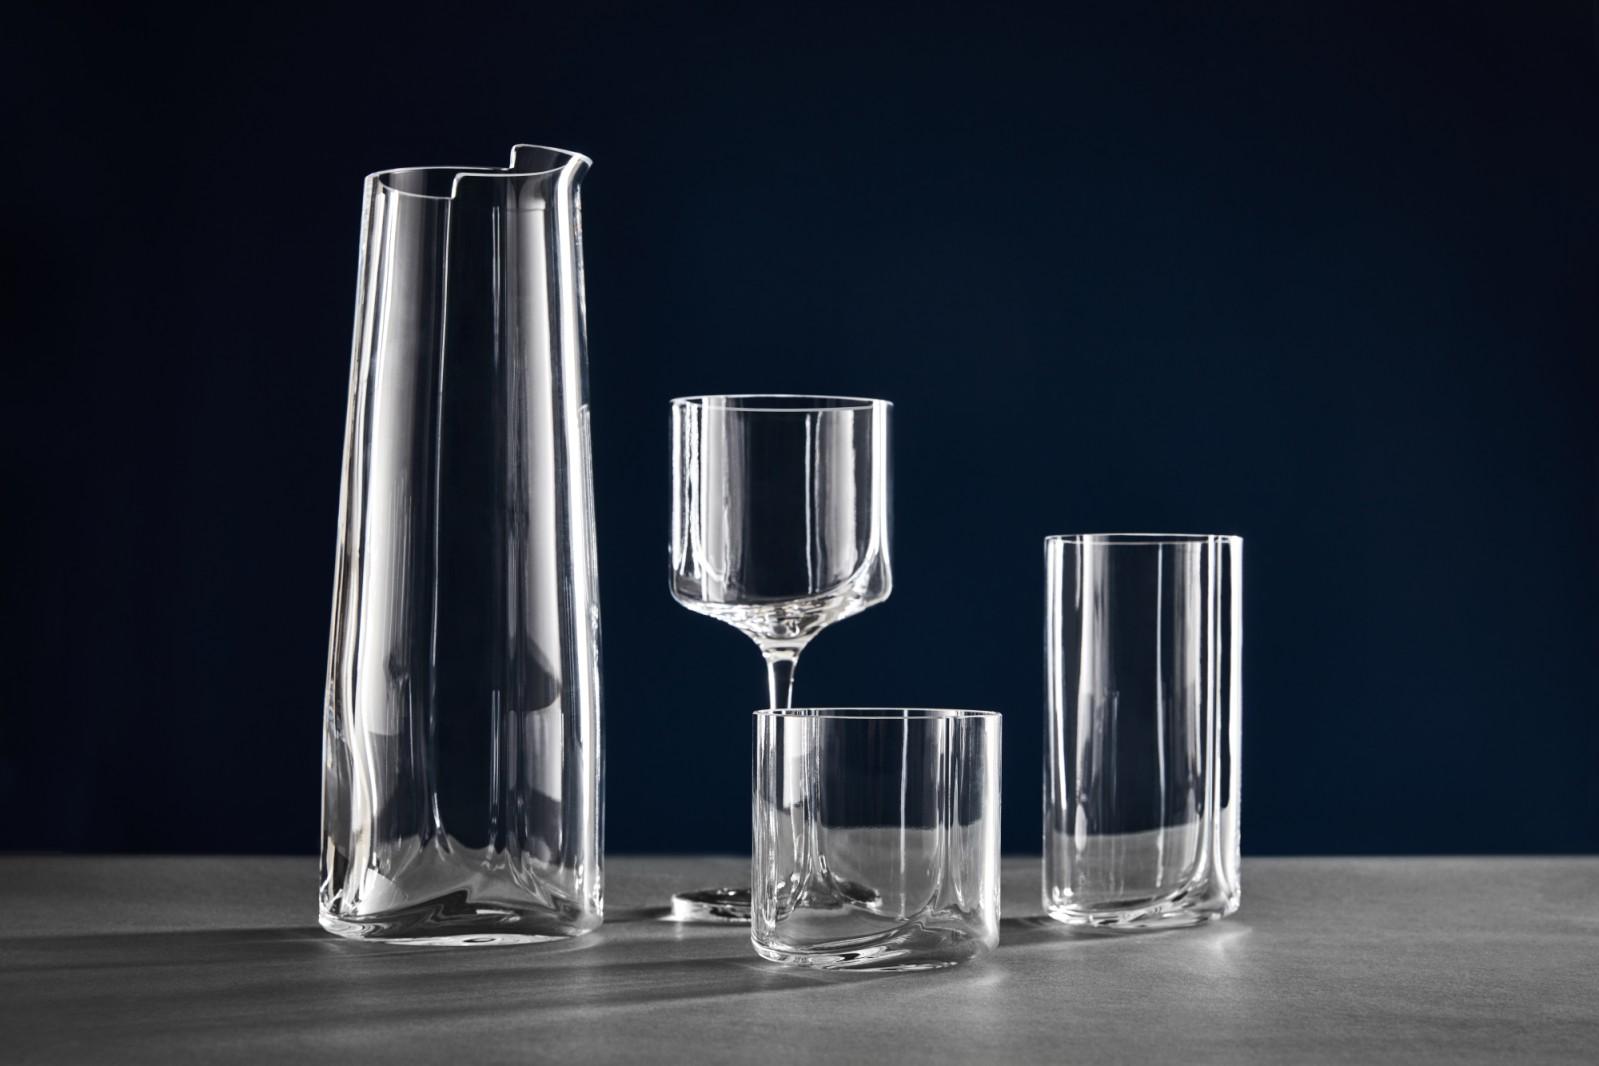 2019 Zaha Hadid Design Collection